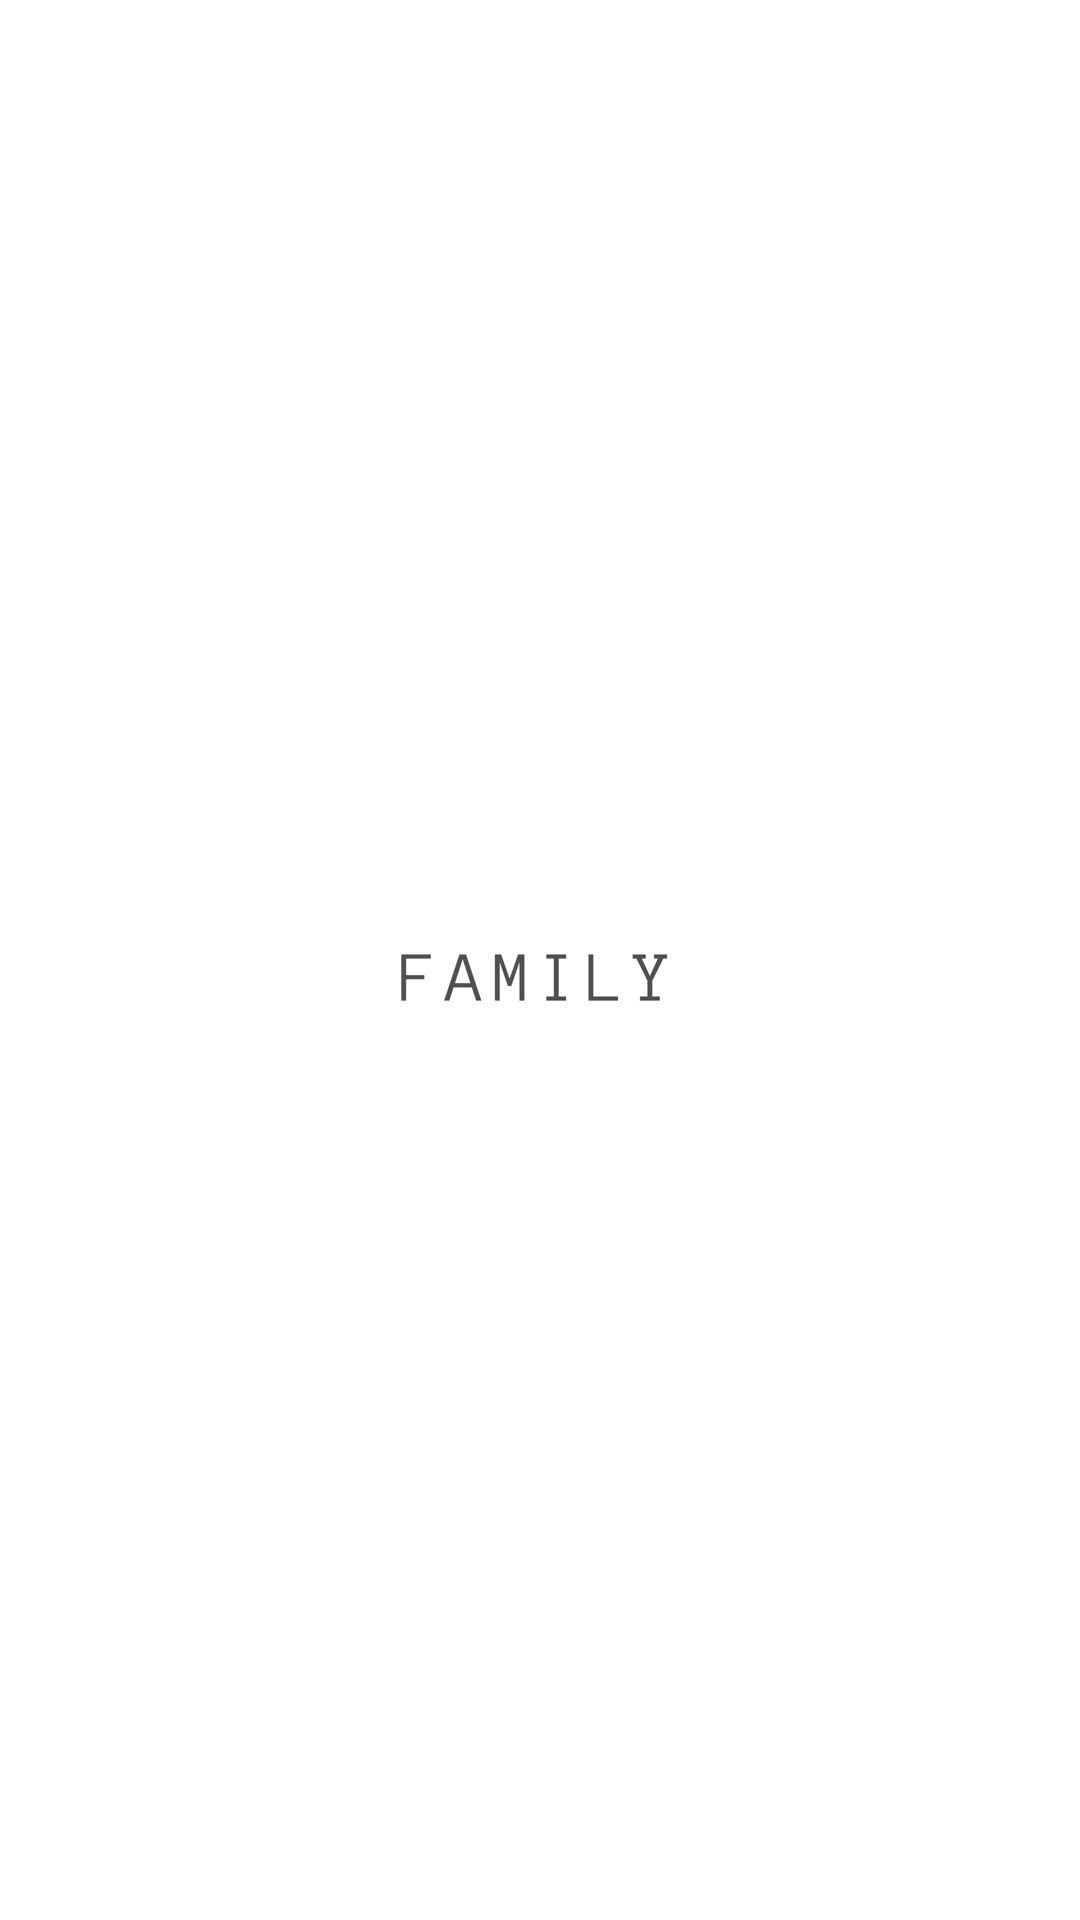 Photo of Minimalist Family Instagram Highlight Cover #instagramhighlights #instagramhighl…,Minimalis…